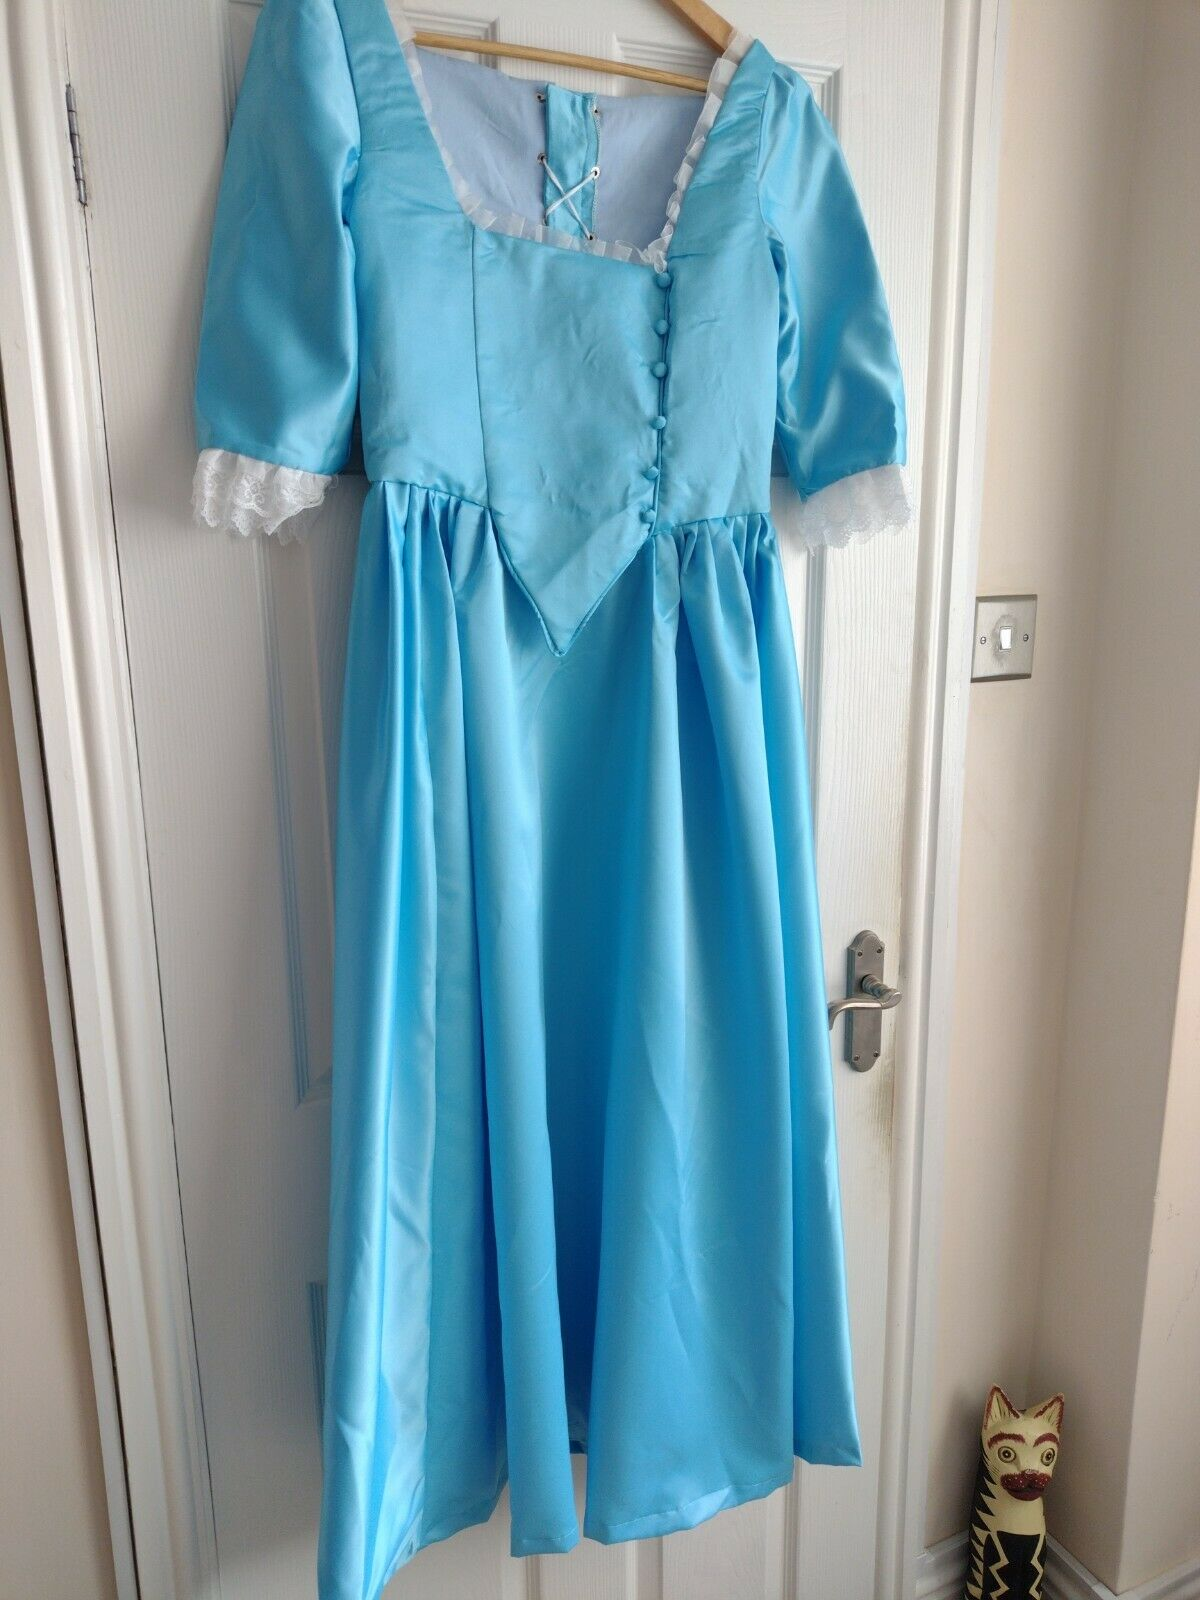 Eliza Hamilton Regency Dress Jane Austen Gown Bridgerton Size 10